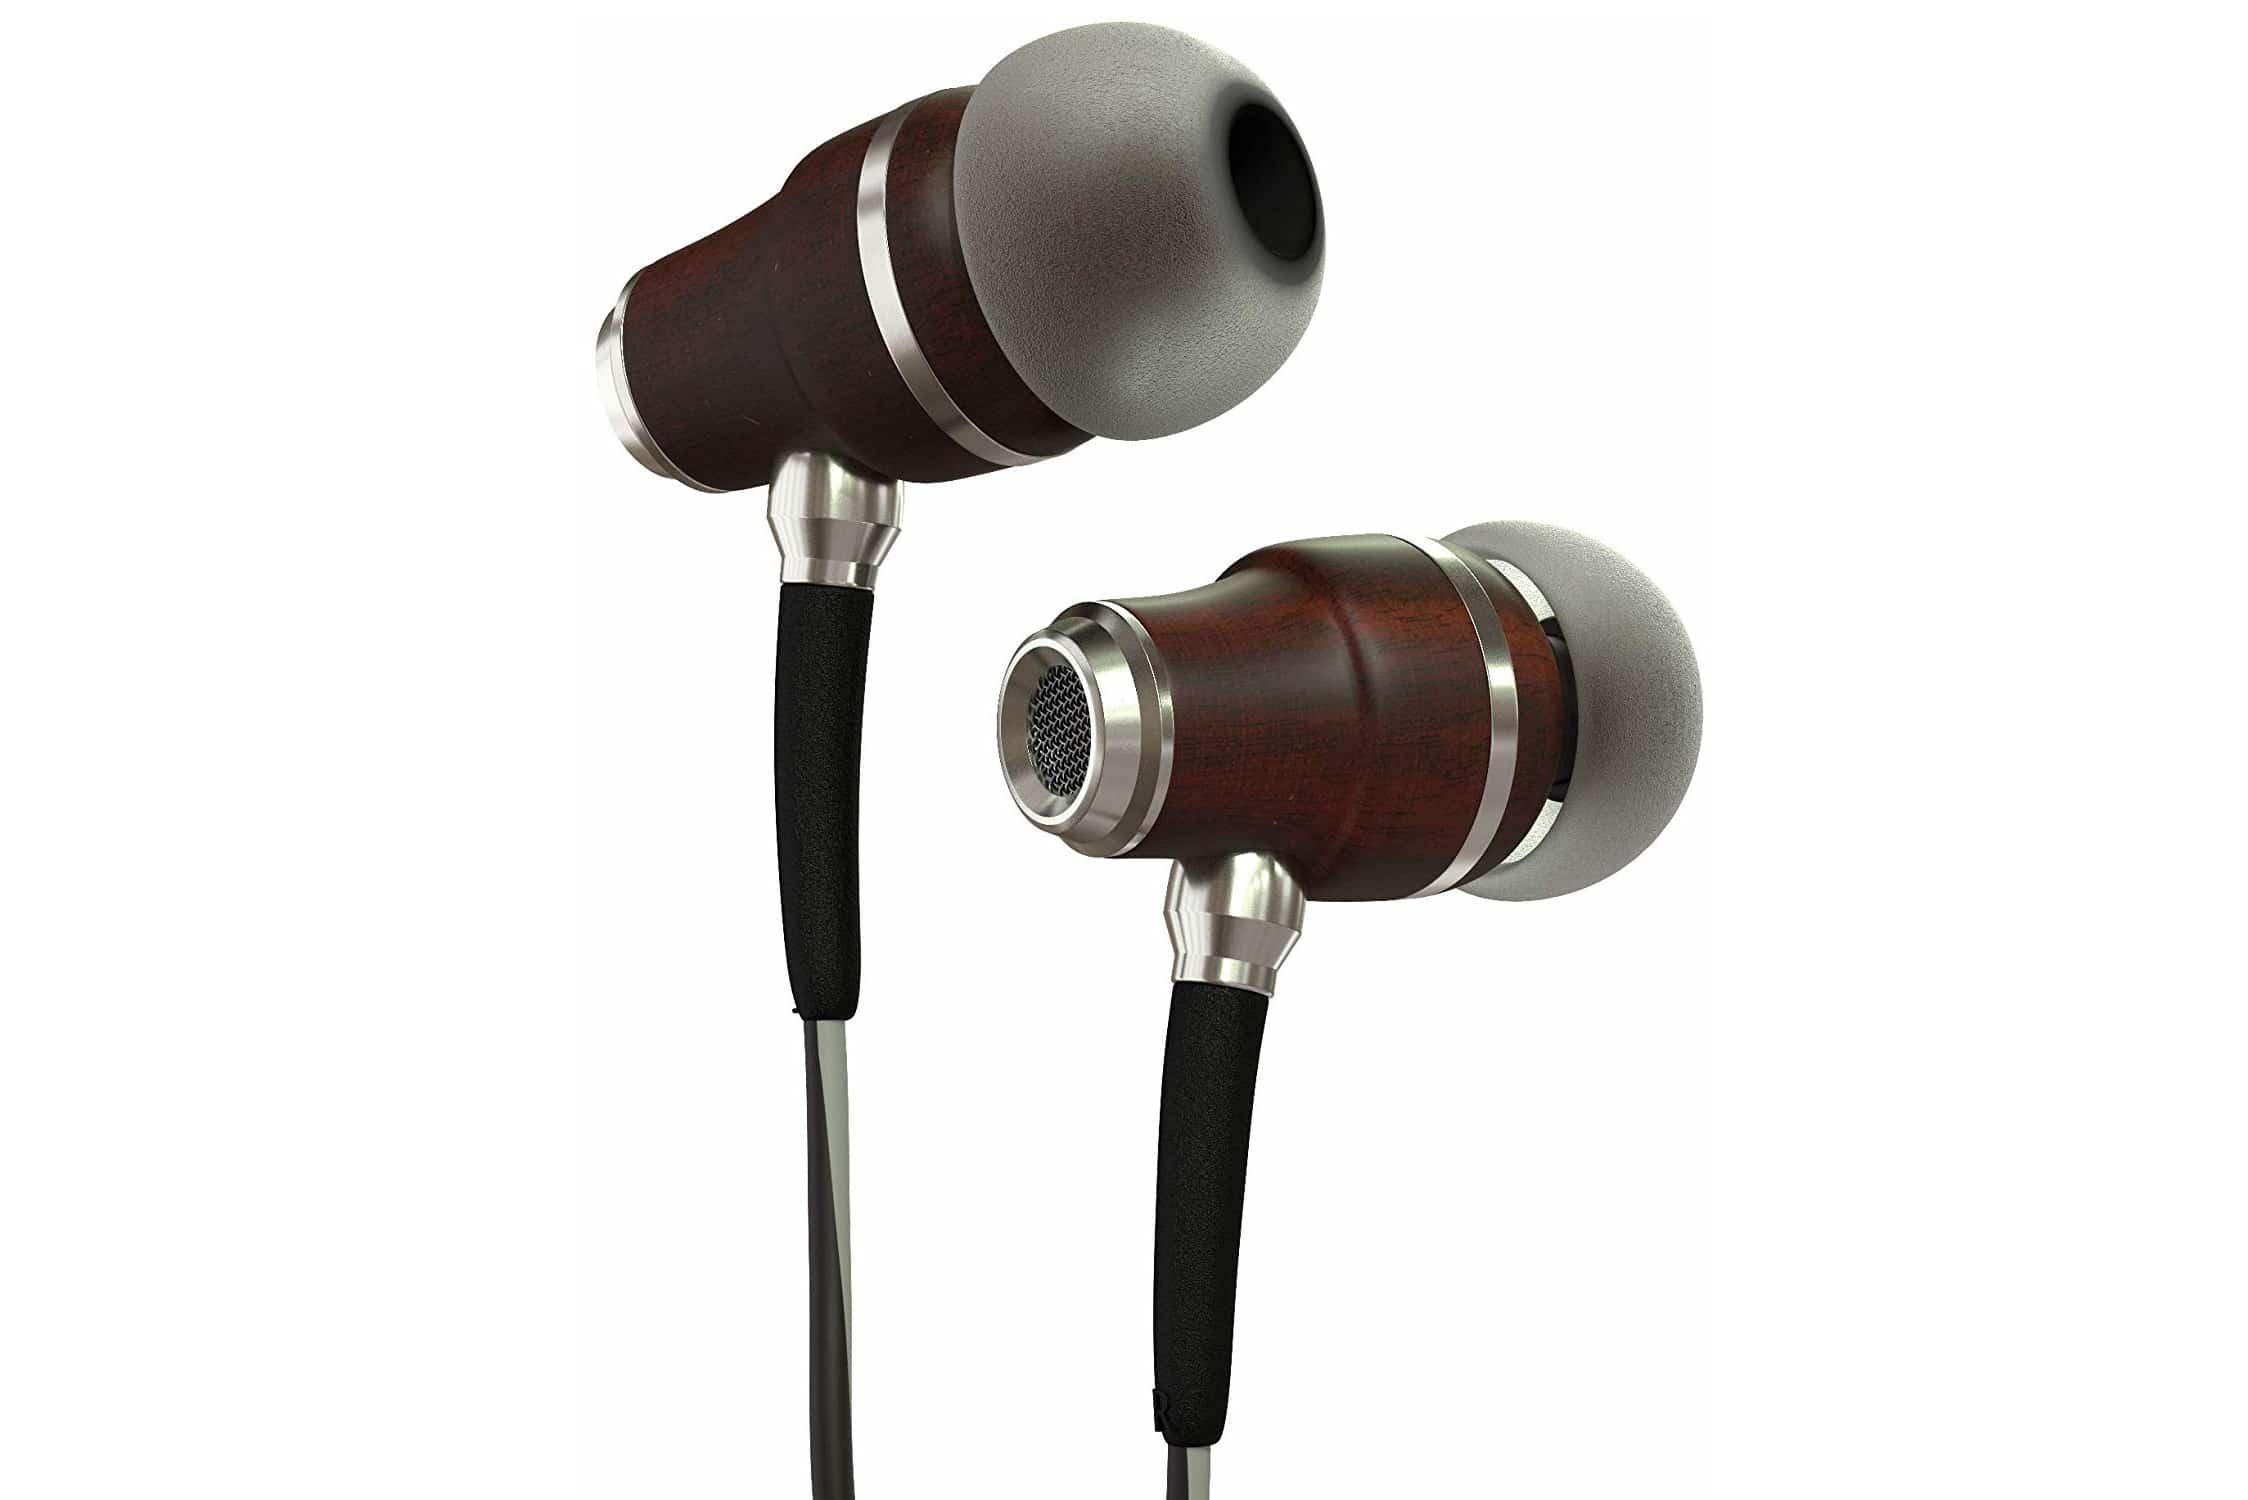 Symphonized nrg 3.0 earbuds - ipad earbuds